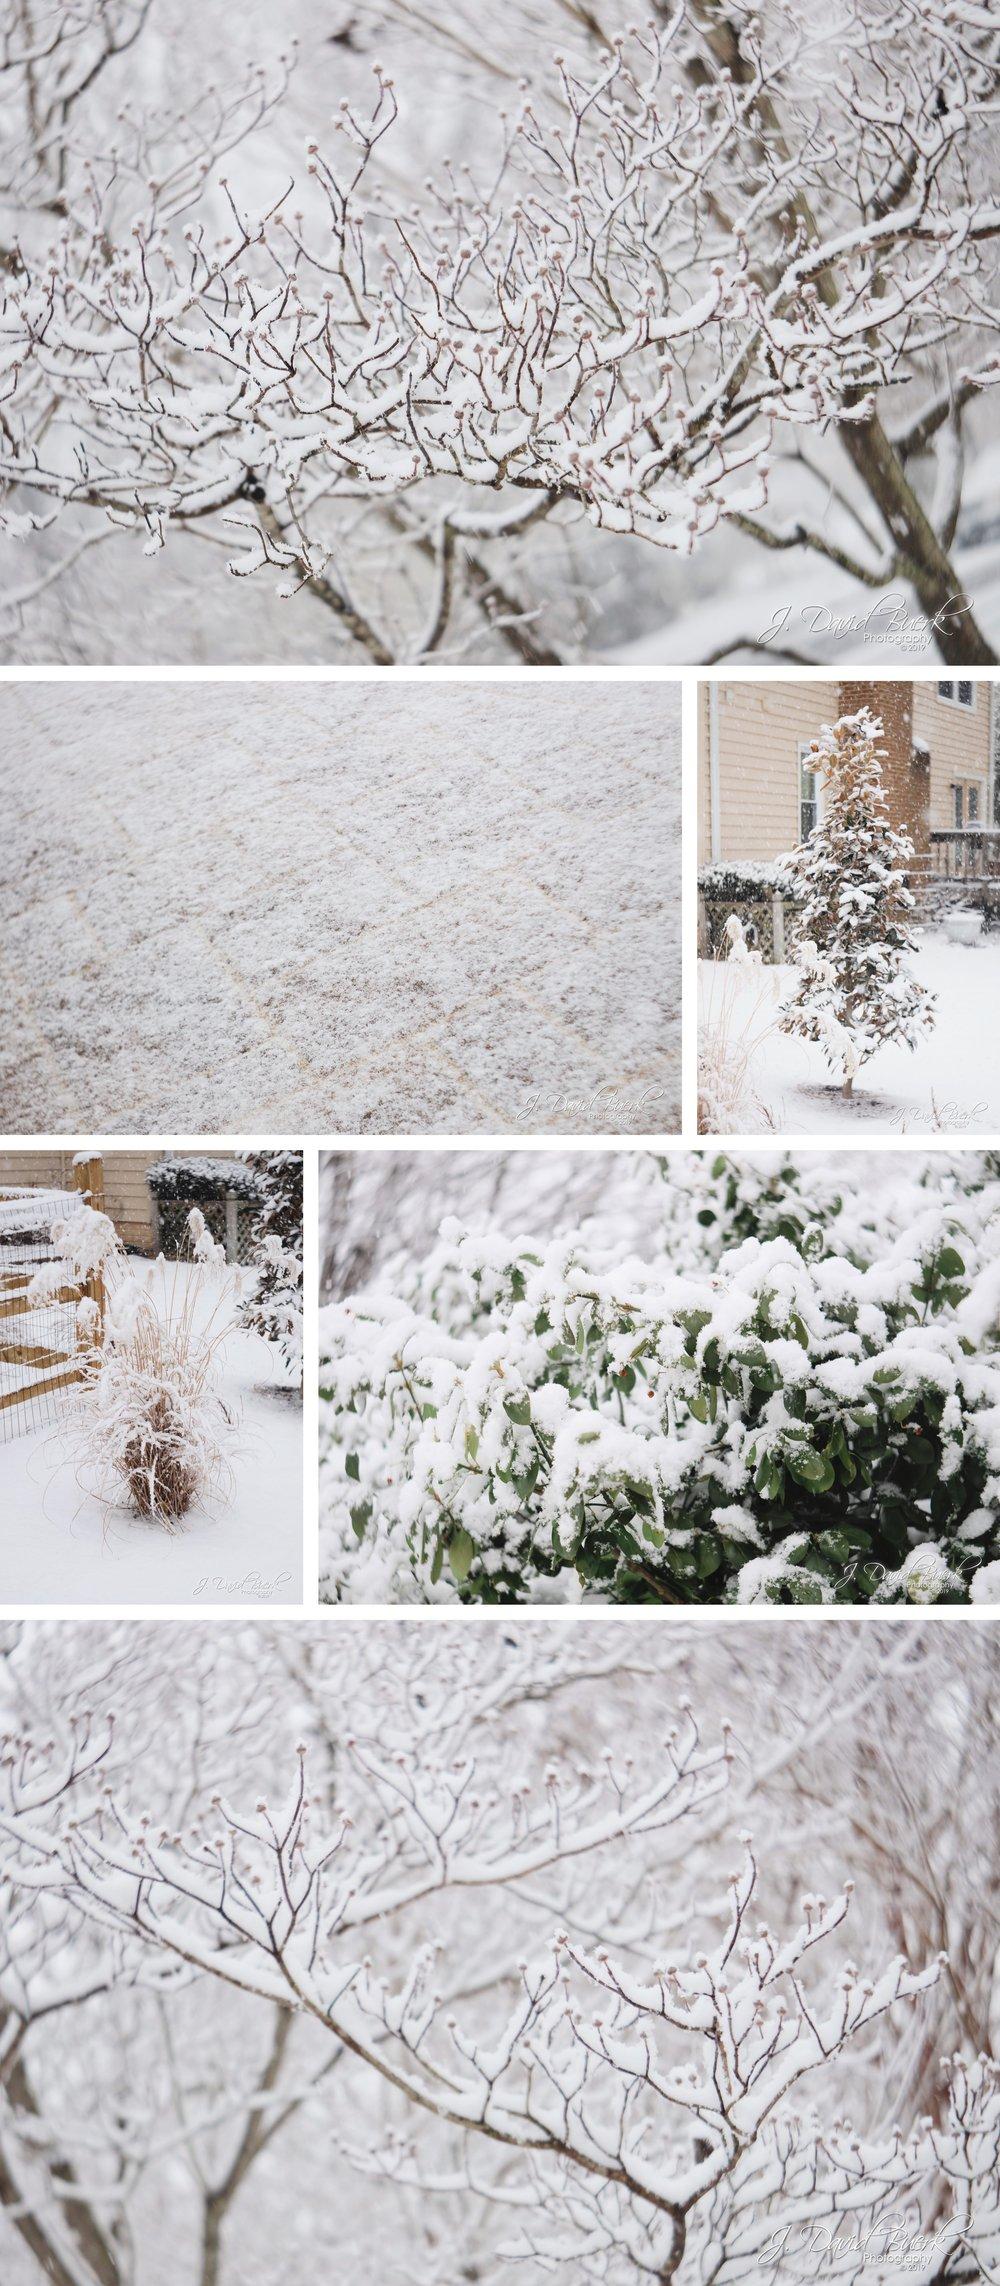 20190129 - Snow Squall 1.jpg